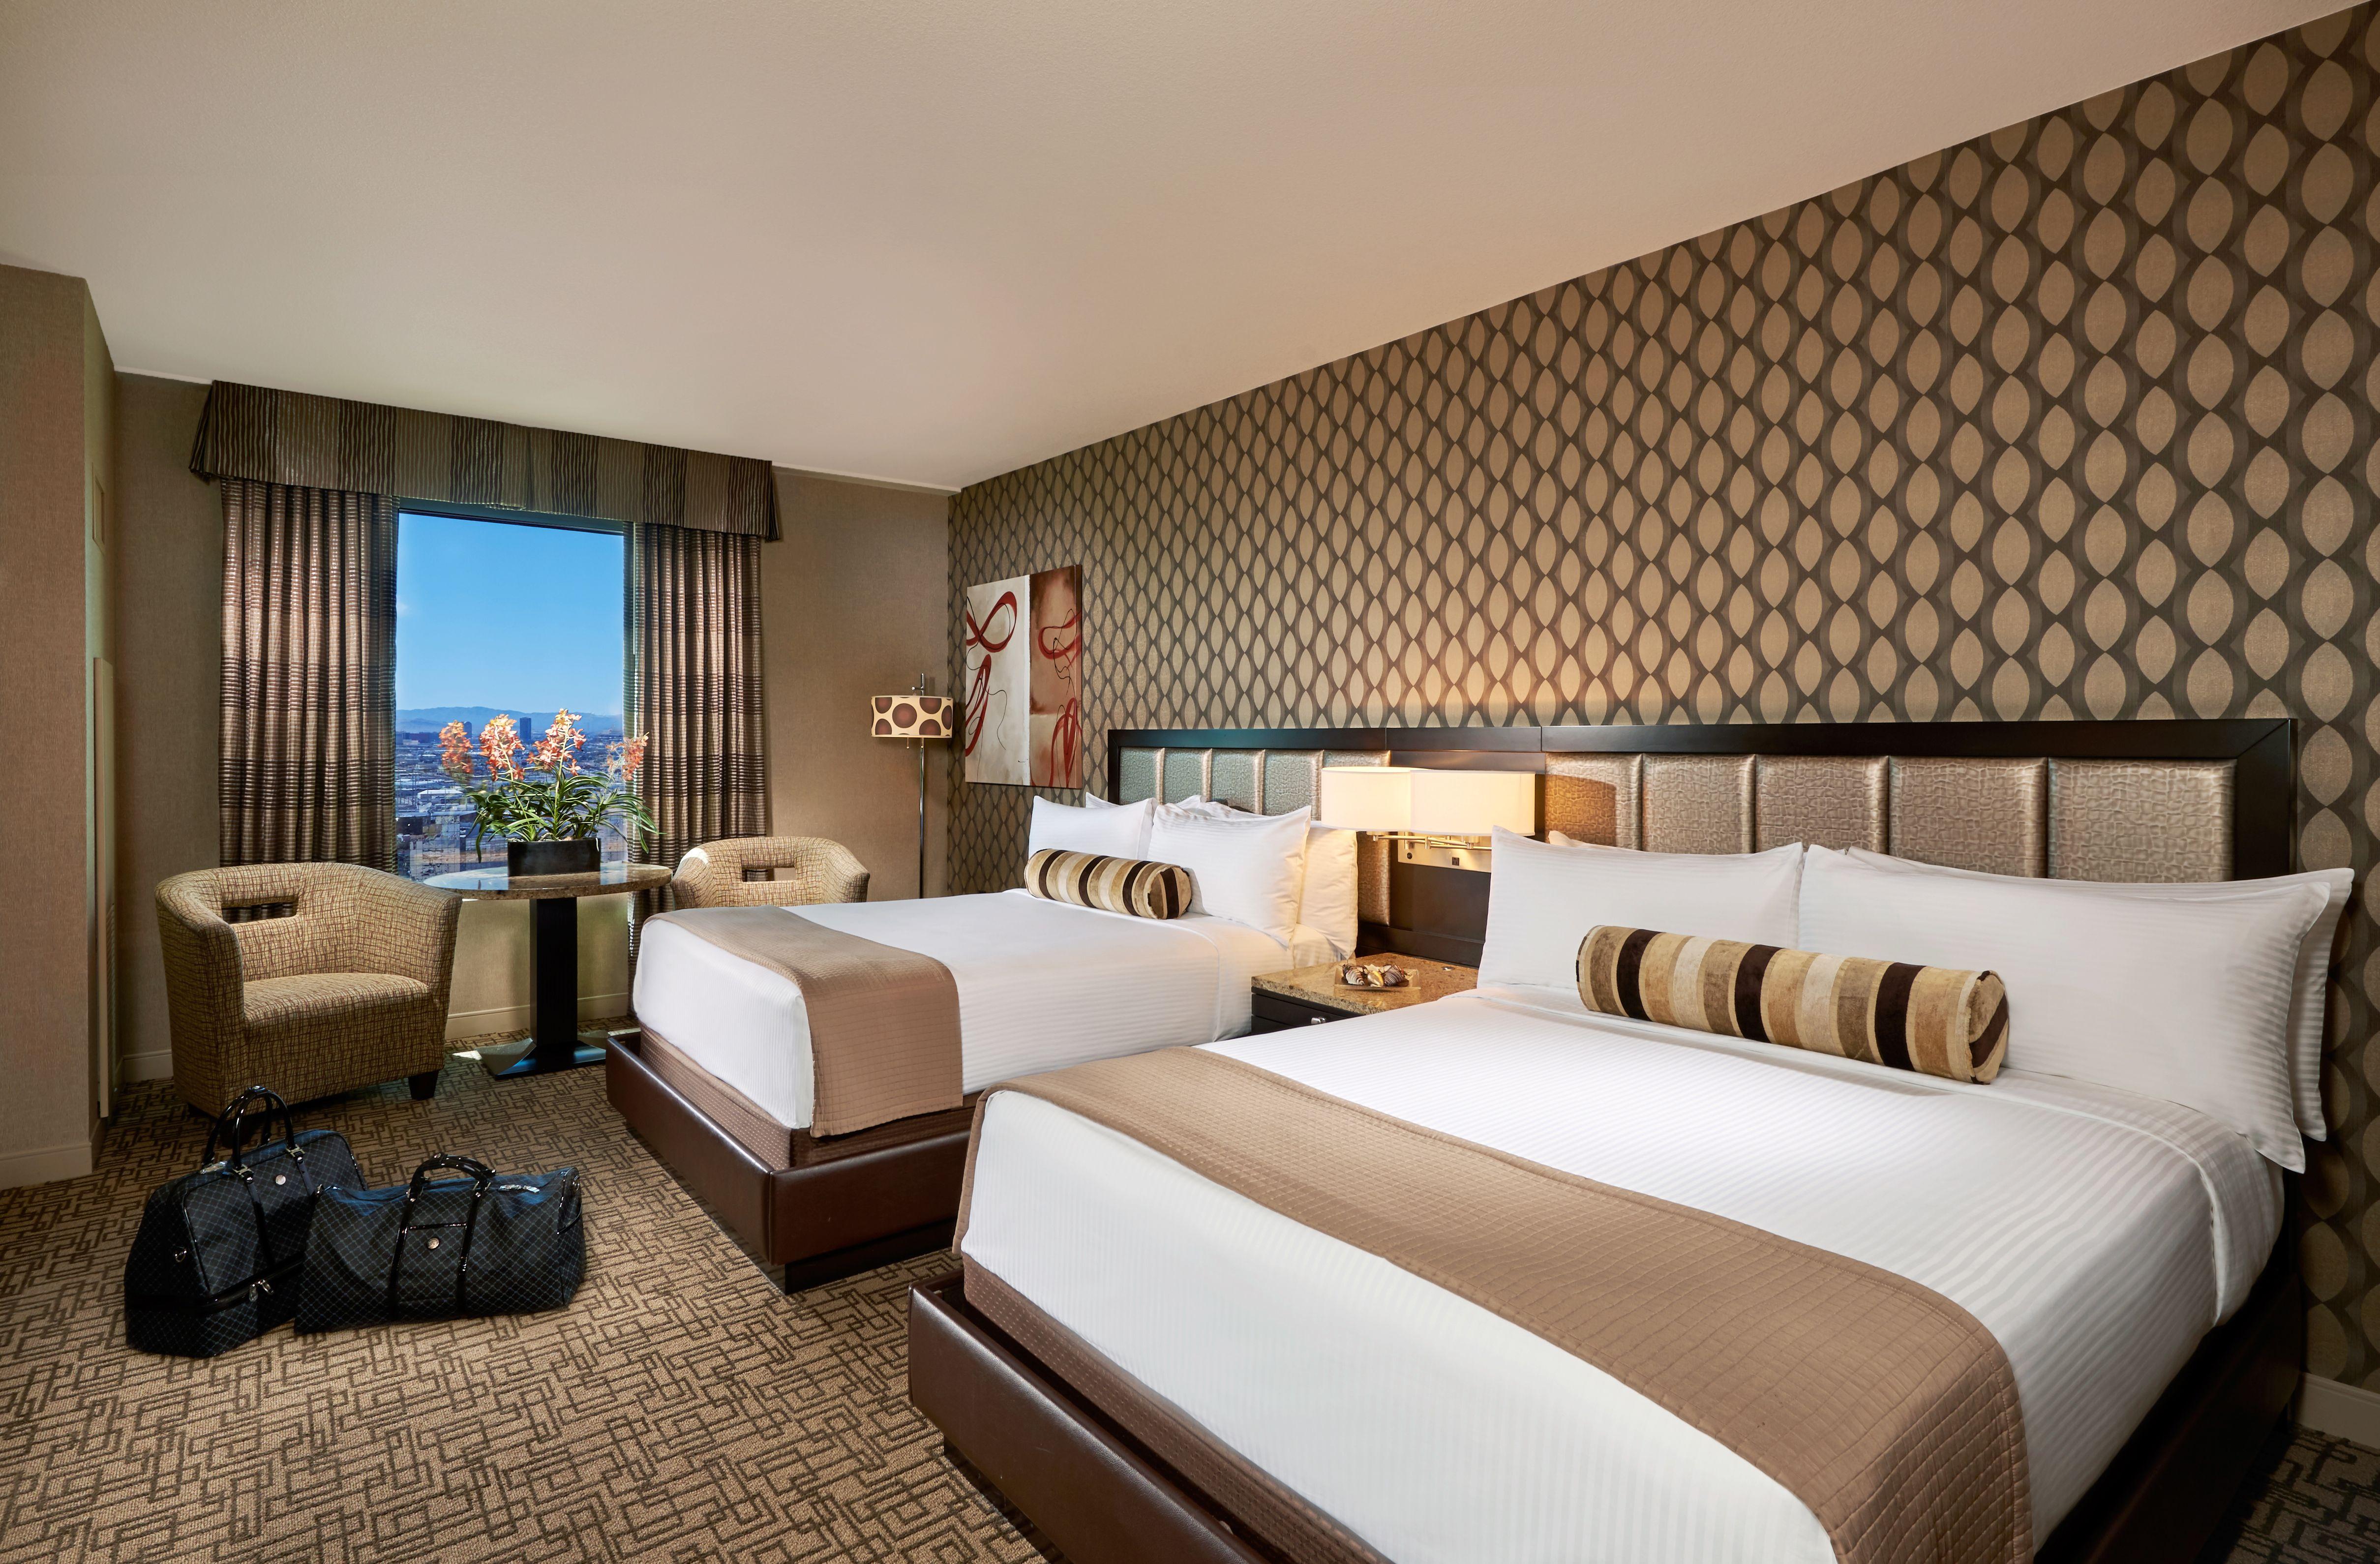 pyramid en deluxe room king casino las luxor vegas rooms hotel in